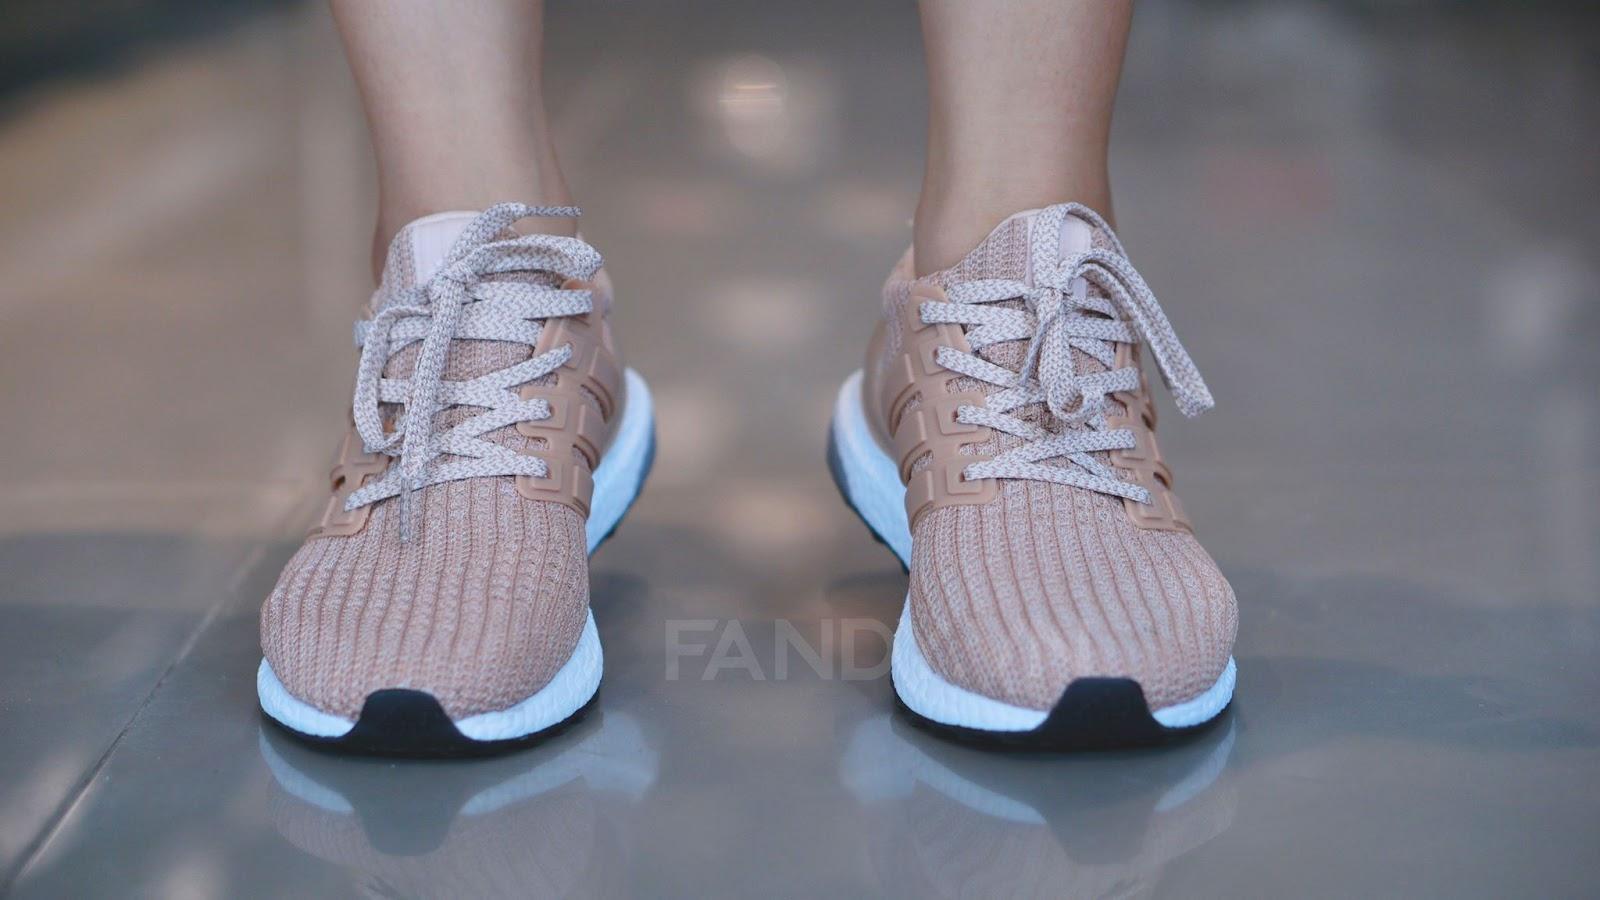 Ultraboost Shoes Grey 11 Womens Adidas Ultra Pinterest